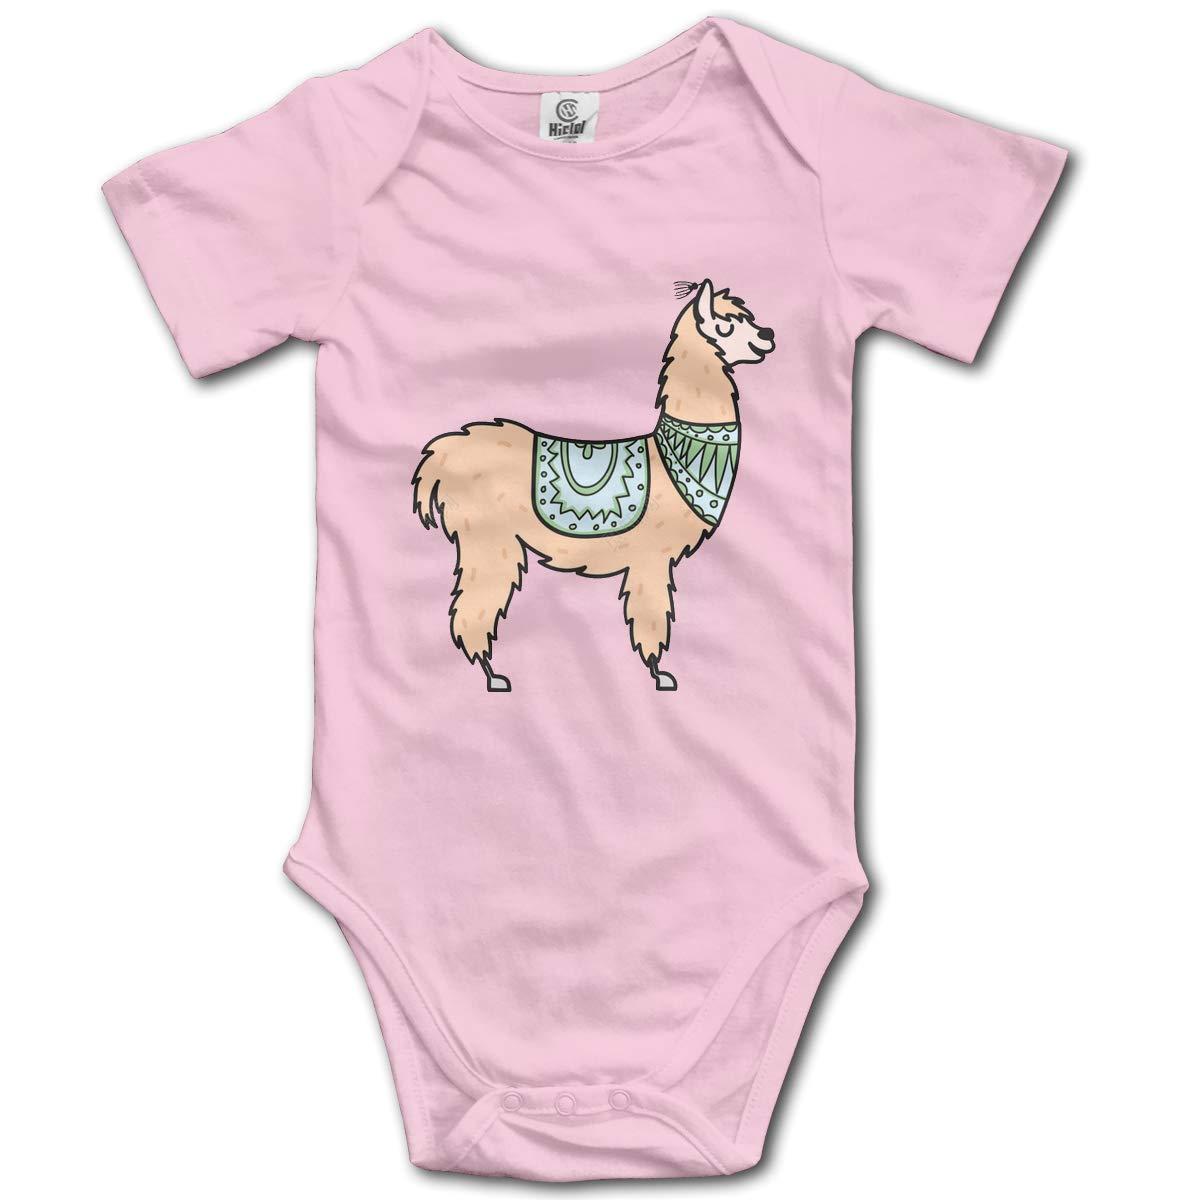 Peru Animal Alpaca Newborn Infant Toddler Baby Girls Boys Bodysuit Short Sleeve 0-24 MonthsBlack